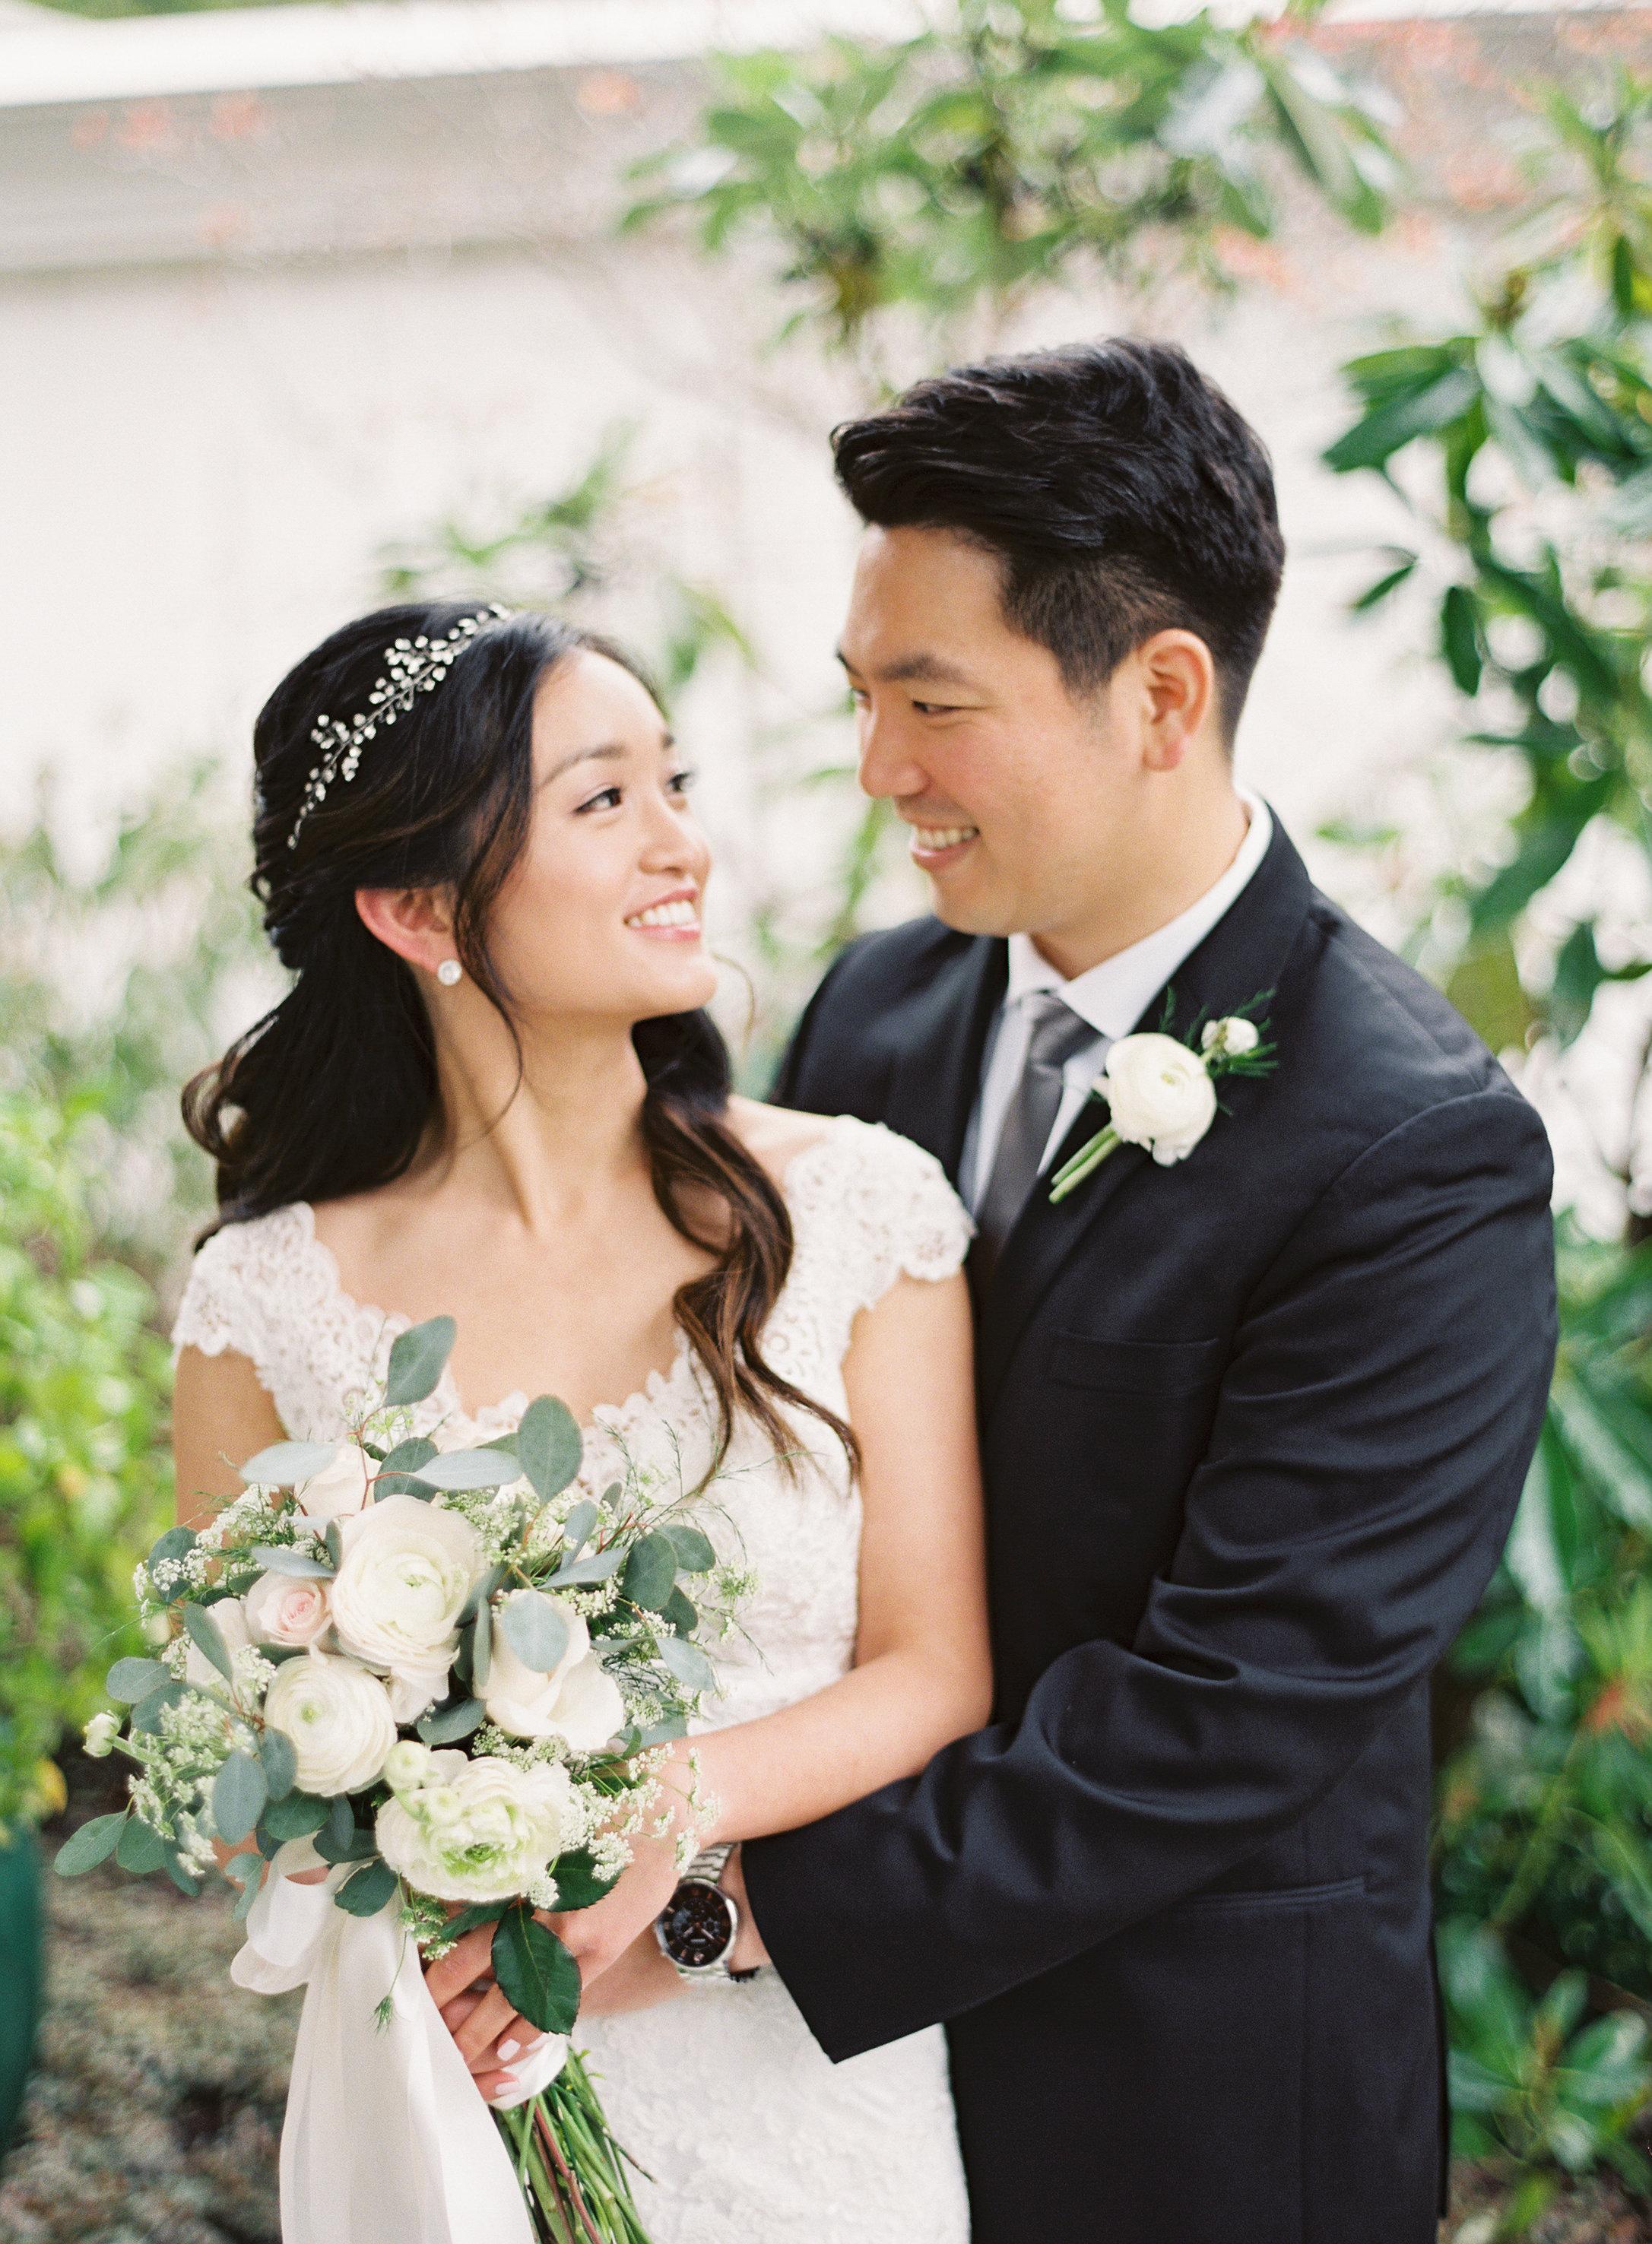 JA_Wedding_Jennifer_Aaron_004.jpg